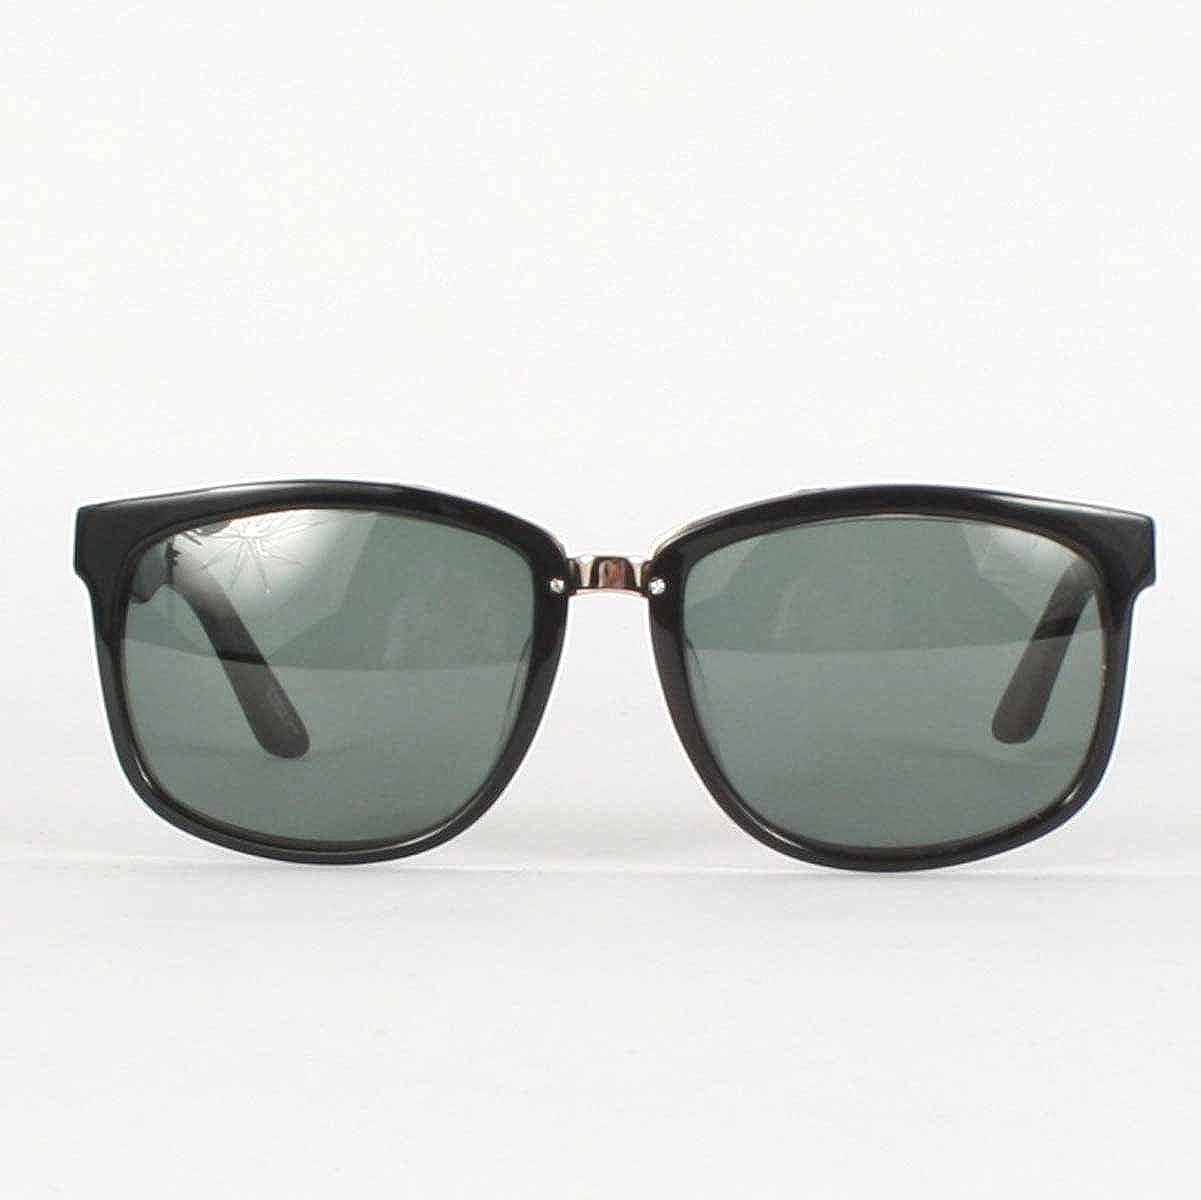 c7d233a315 Amazon.com  Spy Optic Unisex Midtown Crosstown Collection Eyewear ...